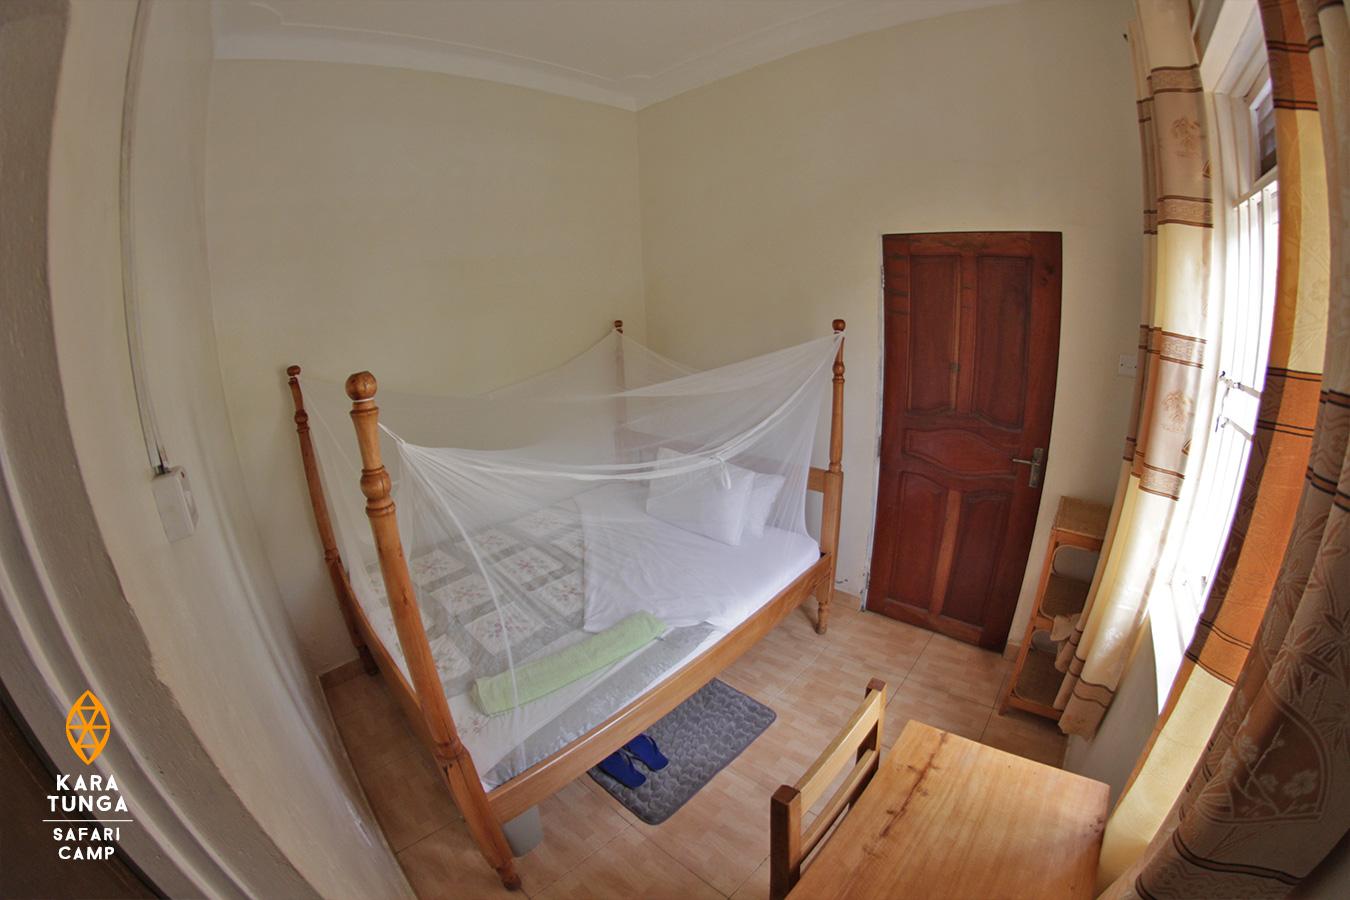 karamoja safari camp hotel moroto basicrooms